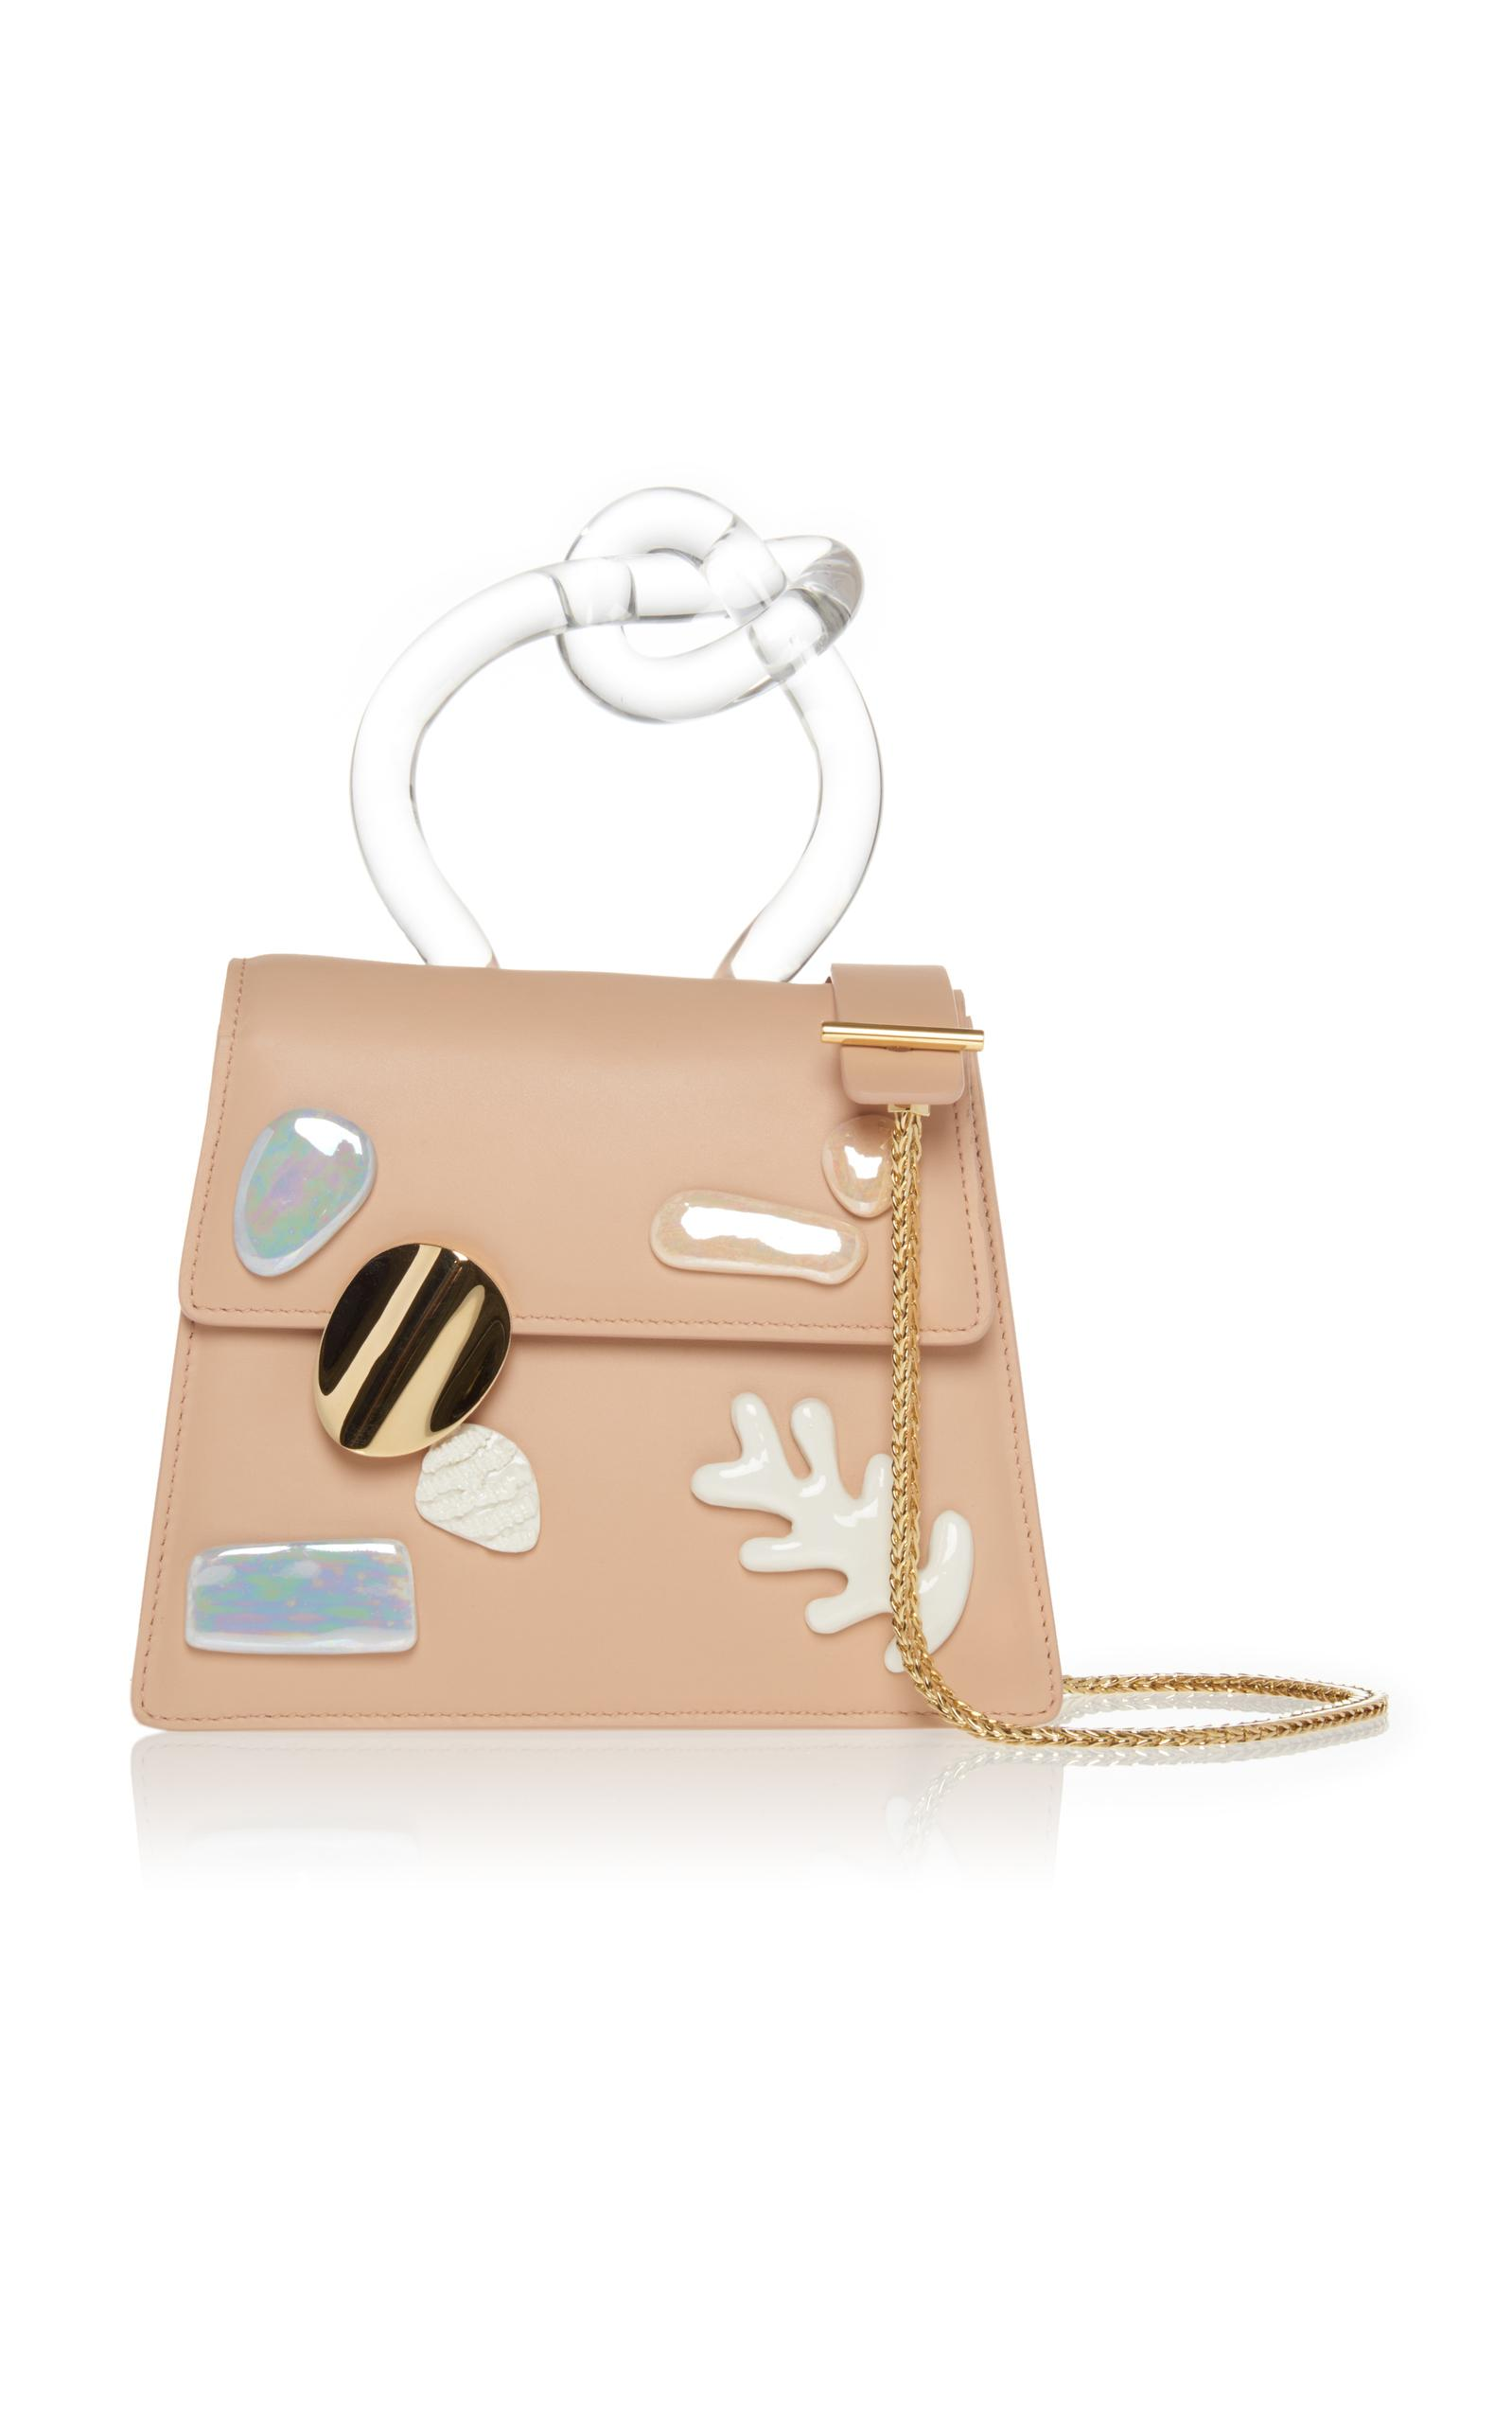 Benedetta Bruzziches Brigitta Top Handle Bag In Neutral